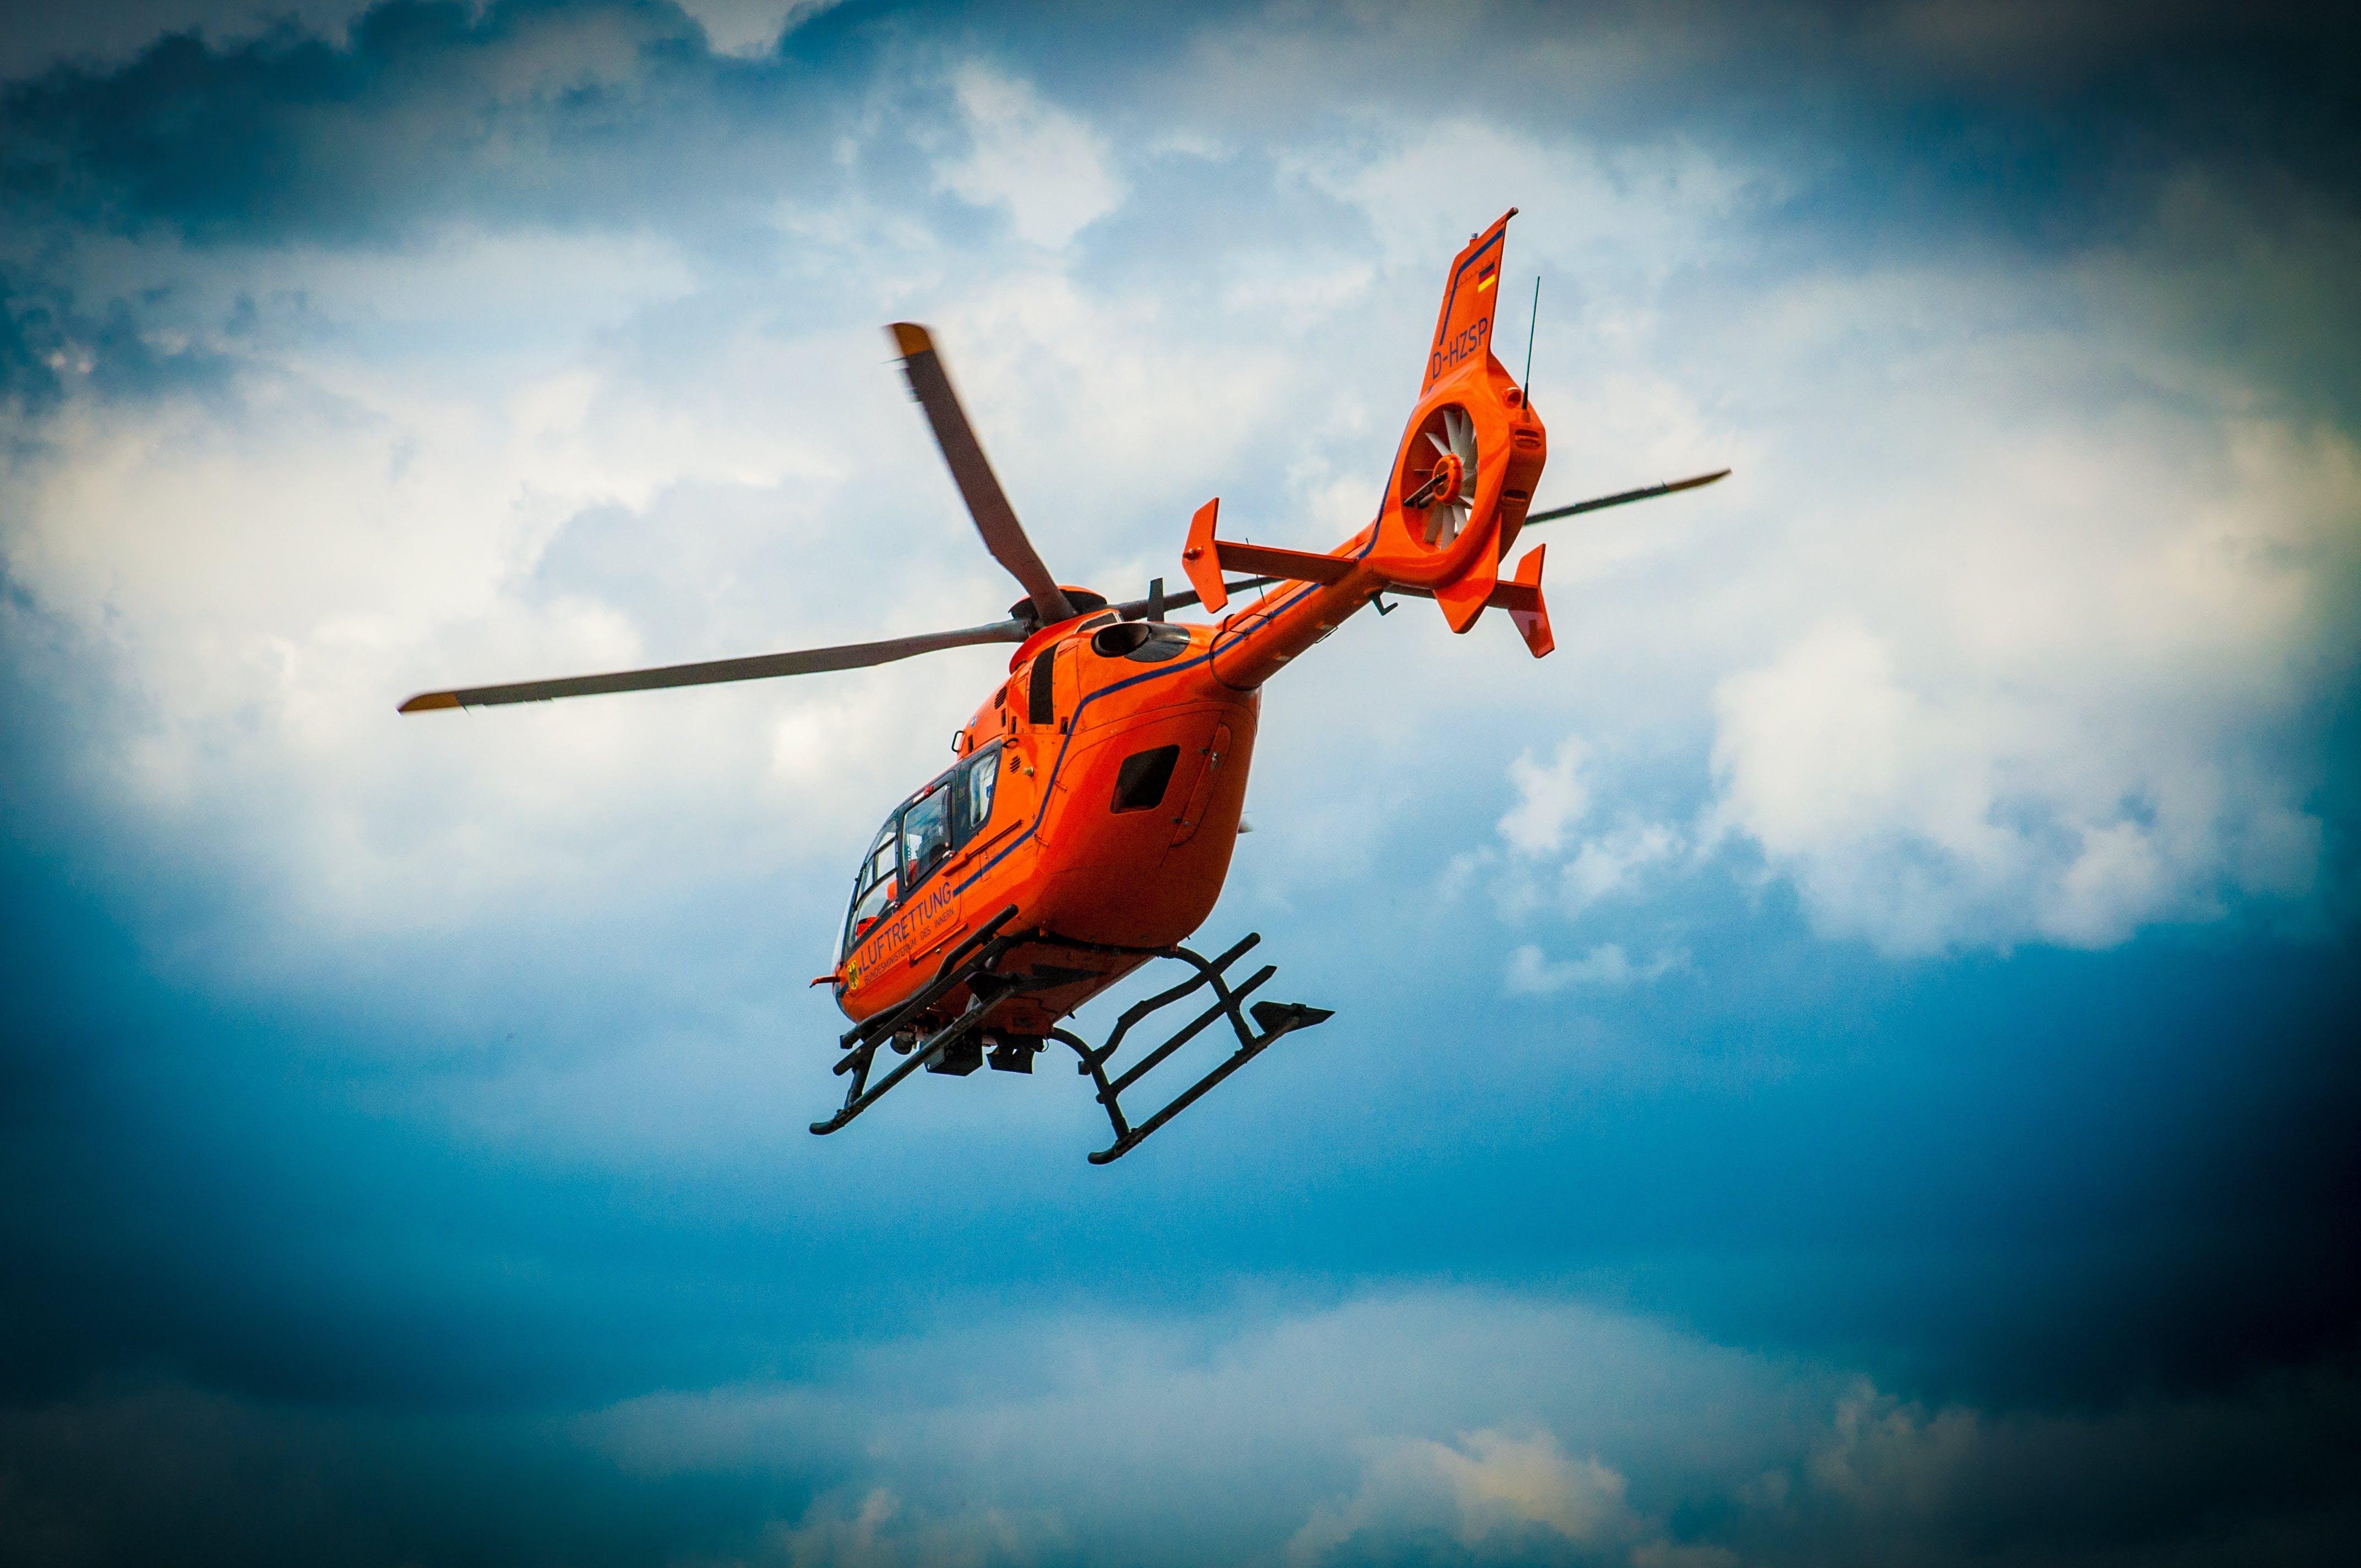 Free stock photo of accident rescue, ambulance helicopter, ambulance service, emergency